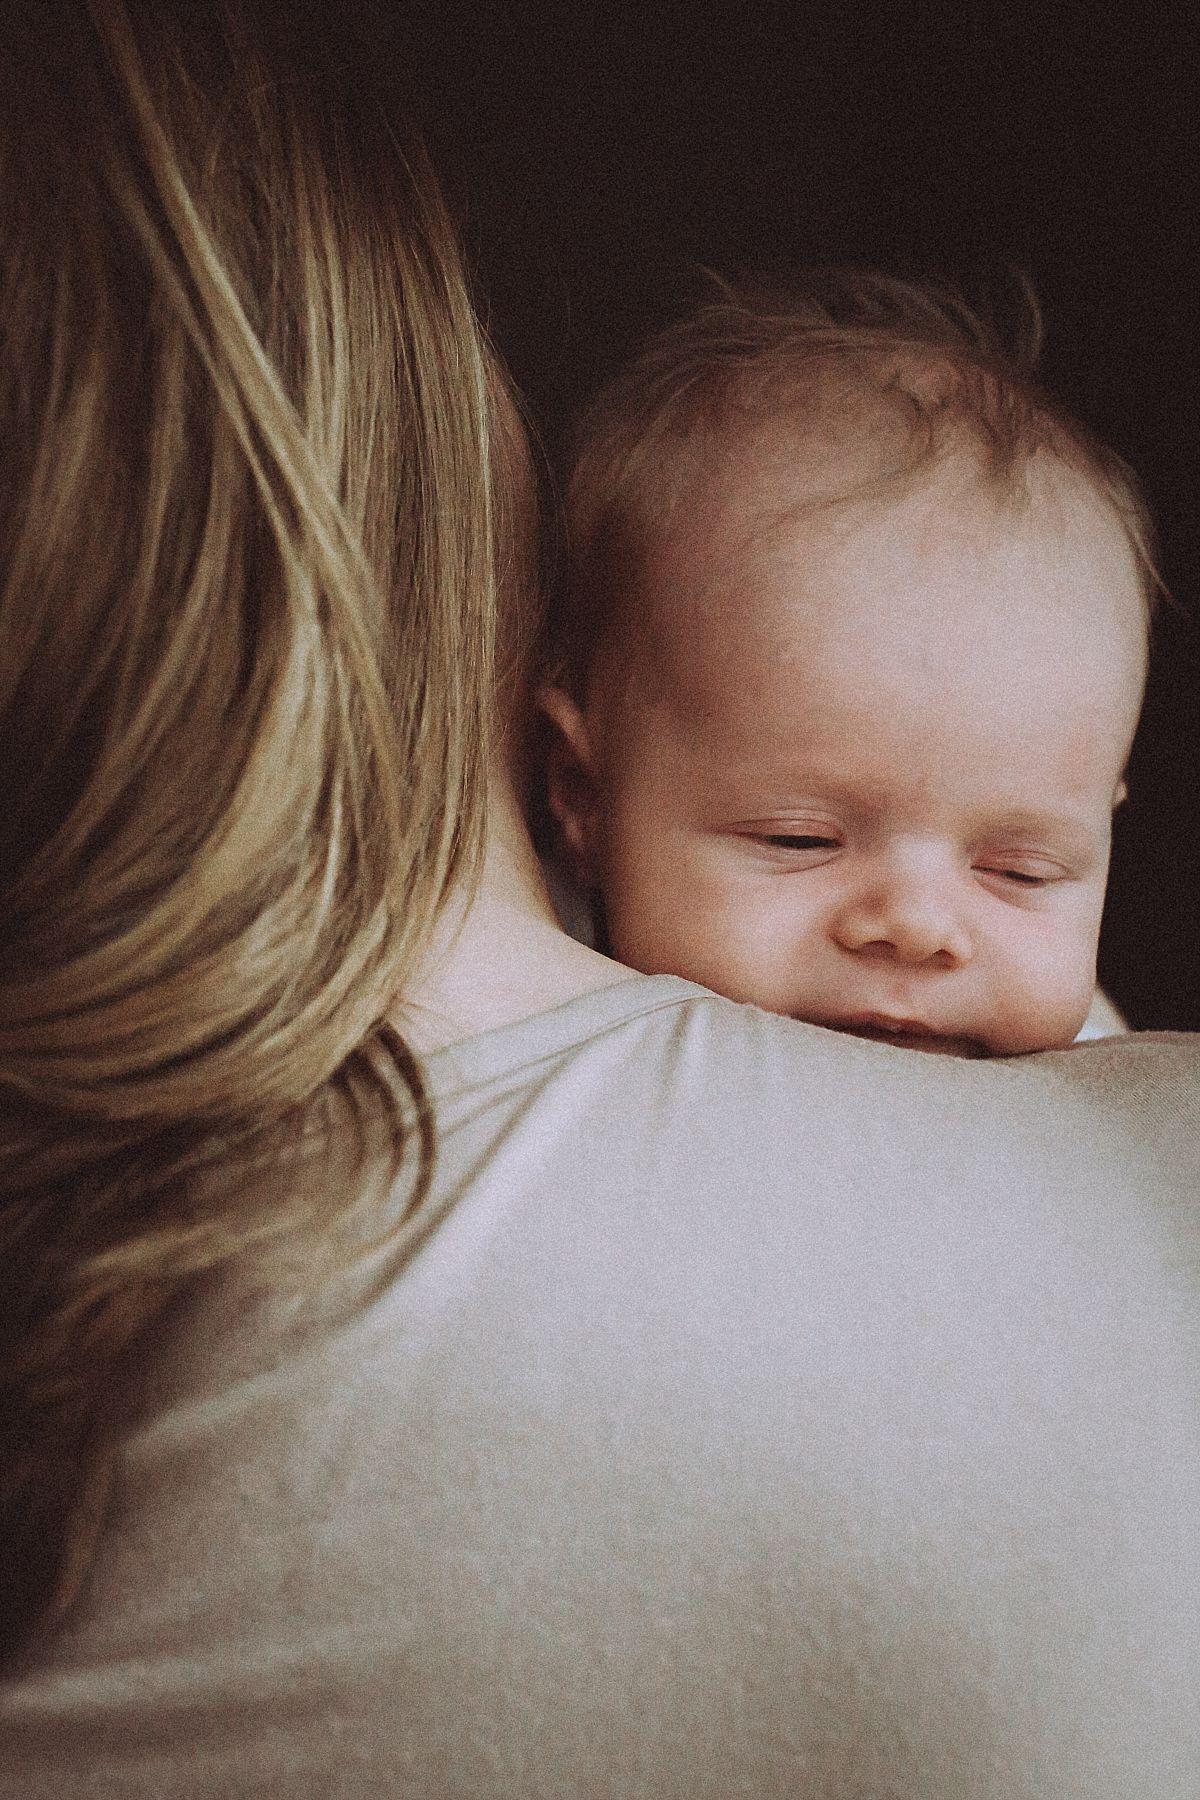 nyc family and newborn photographer newborn baby girl pokes head over mom's shoulder